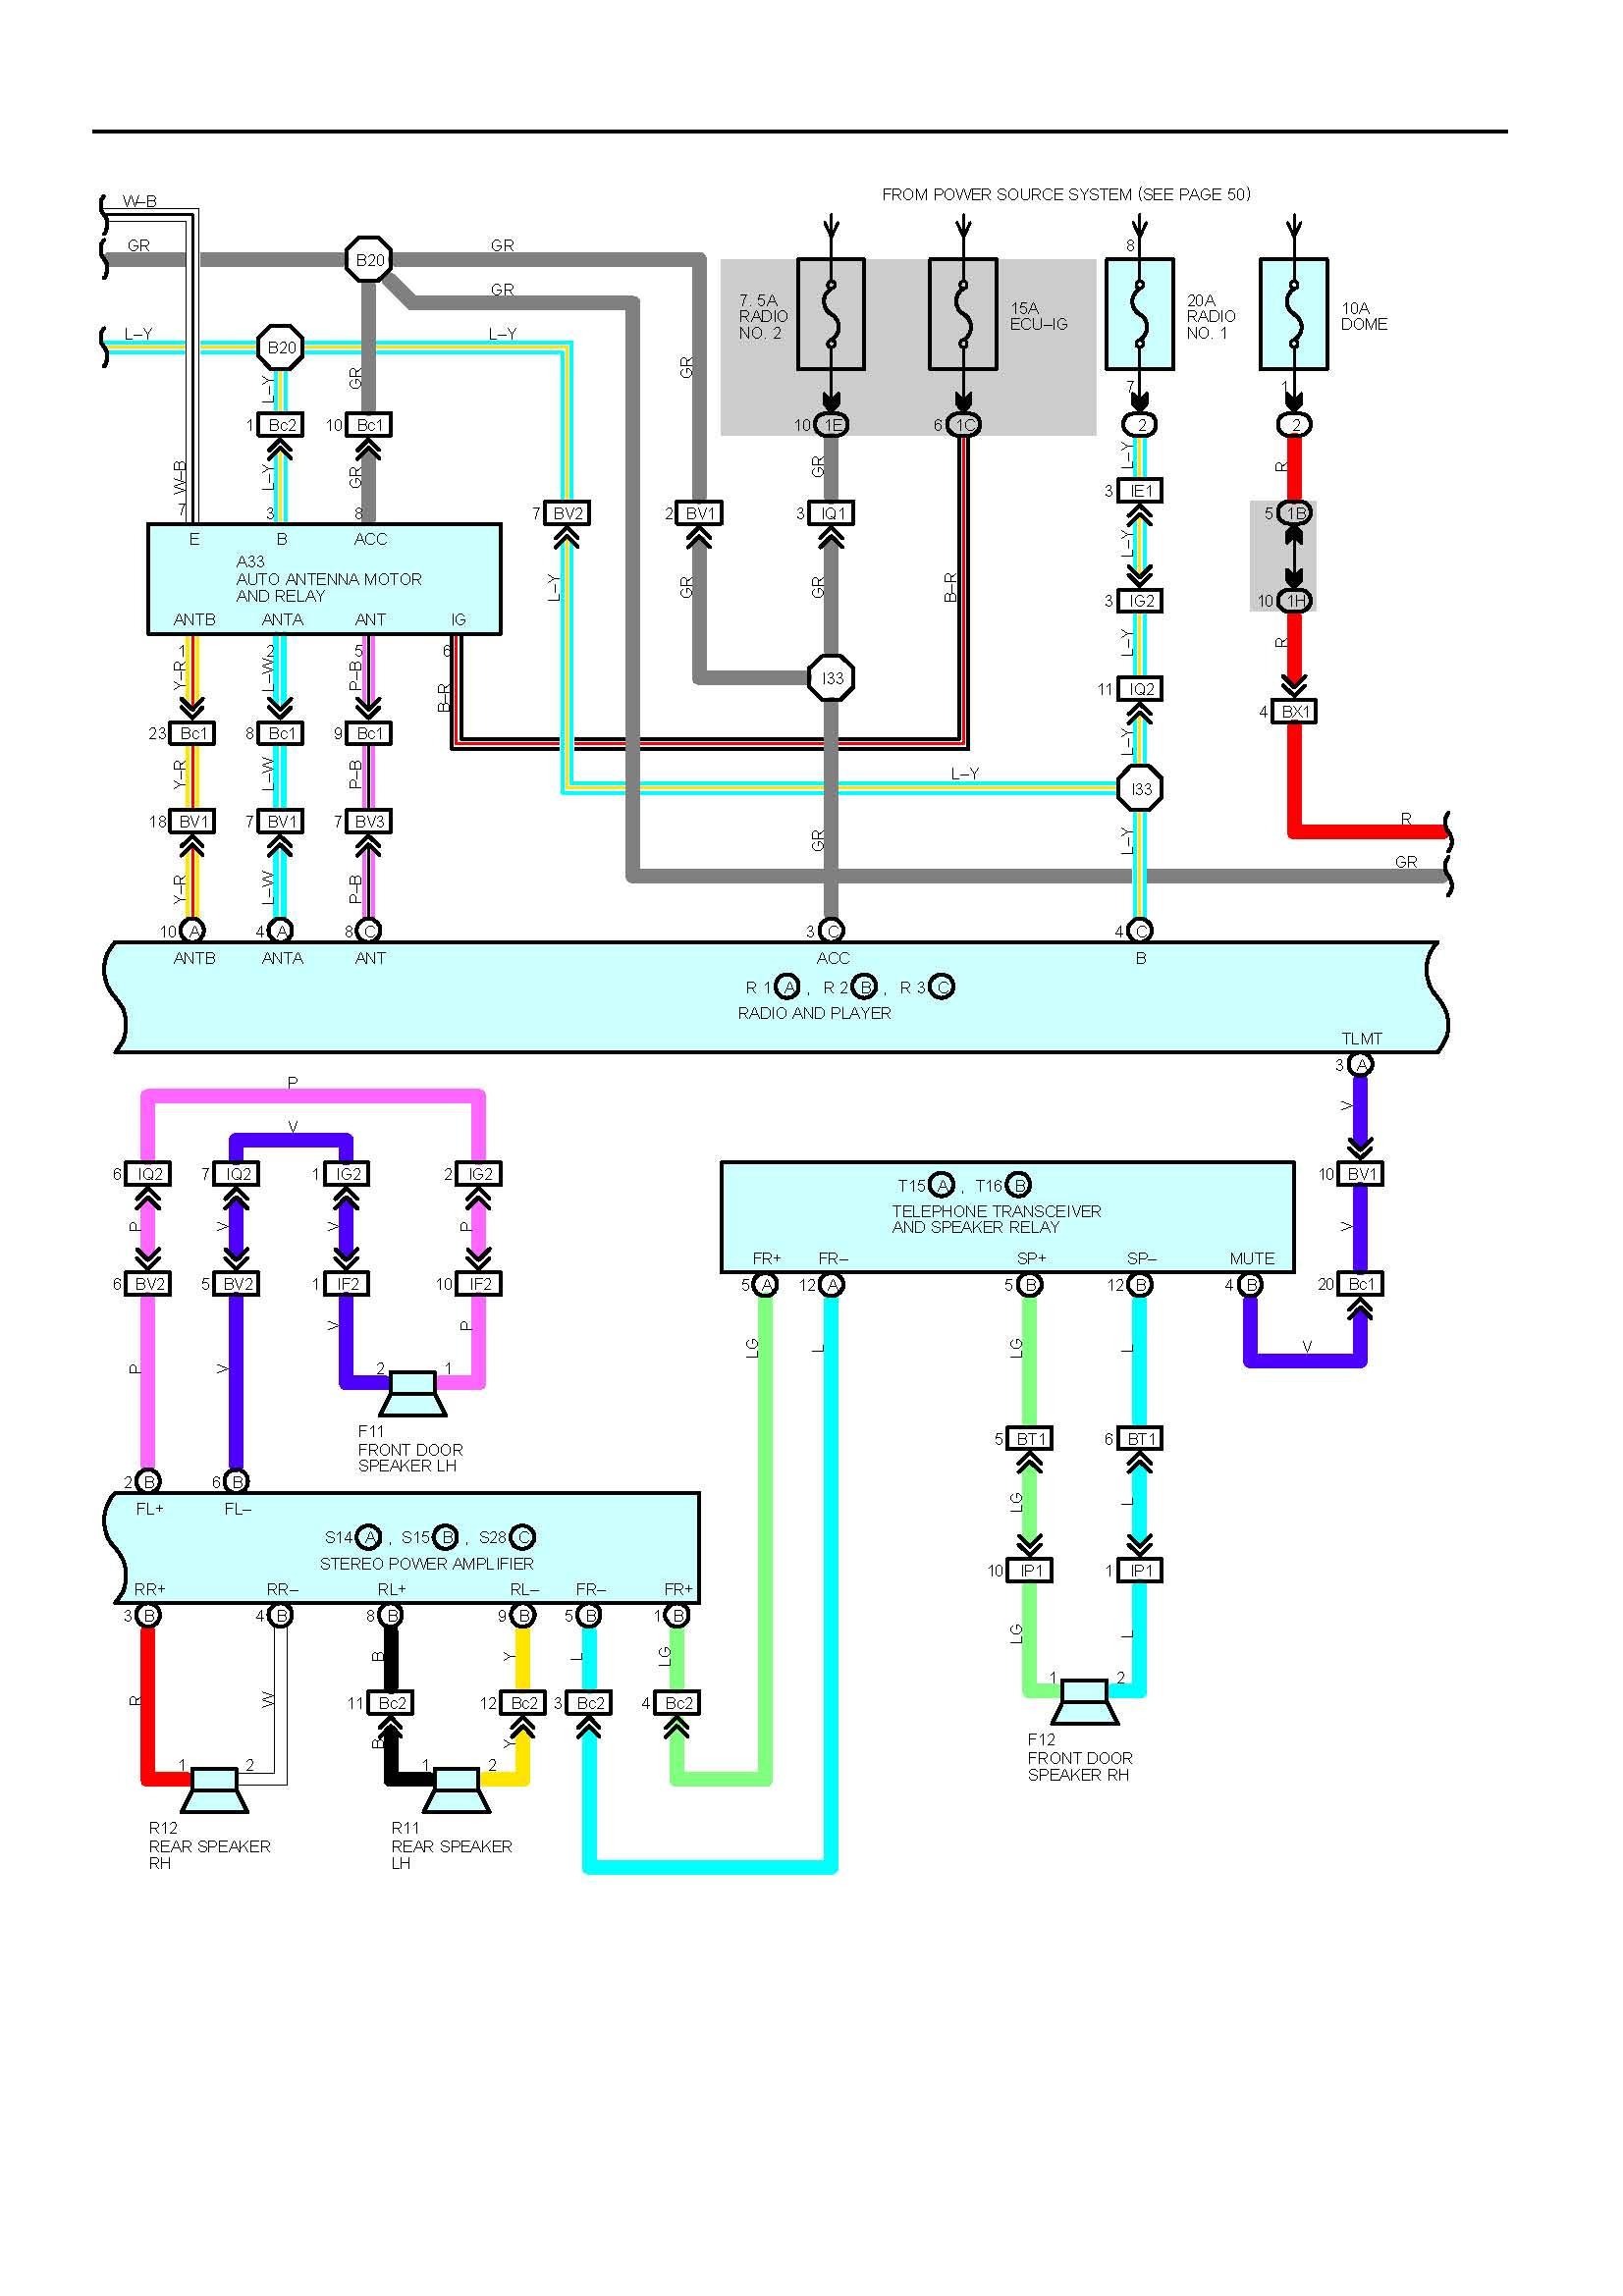 Lexus_SC400_Radio_NAK_Wiring_Diagram_Page_2?resize\\\\\\\\\\\\\\\\\\\\\\\\\\\\\\\\\\\\\\\\\\\\\\\\\\\\\\\\\\\\\\\=665%2C941 1995 fleetwood rv wiring diagram wiring diagrams Typical RV Wiring Diagram at panicattacktreatment.co